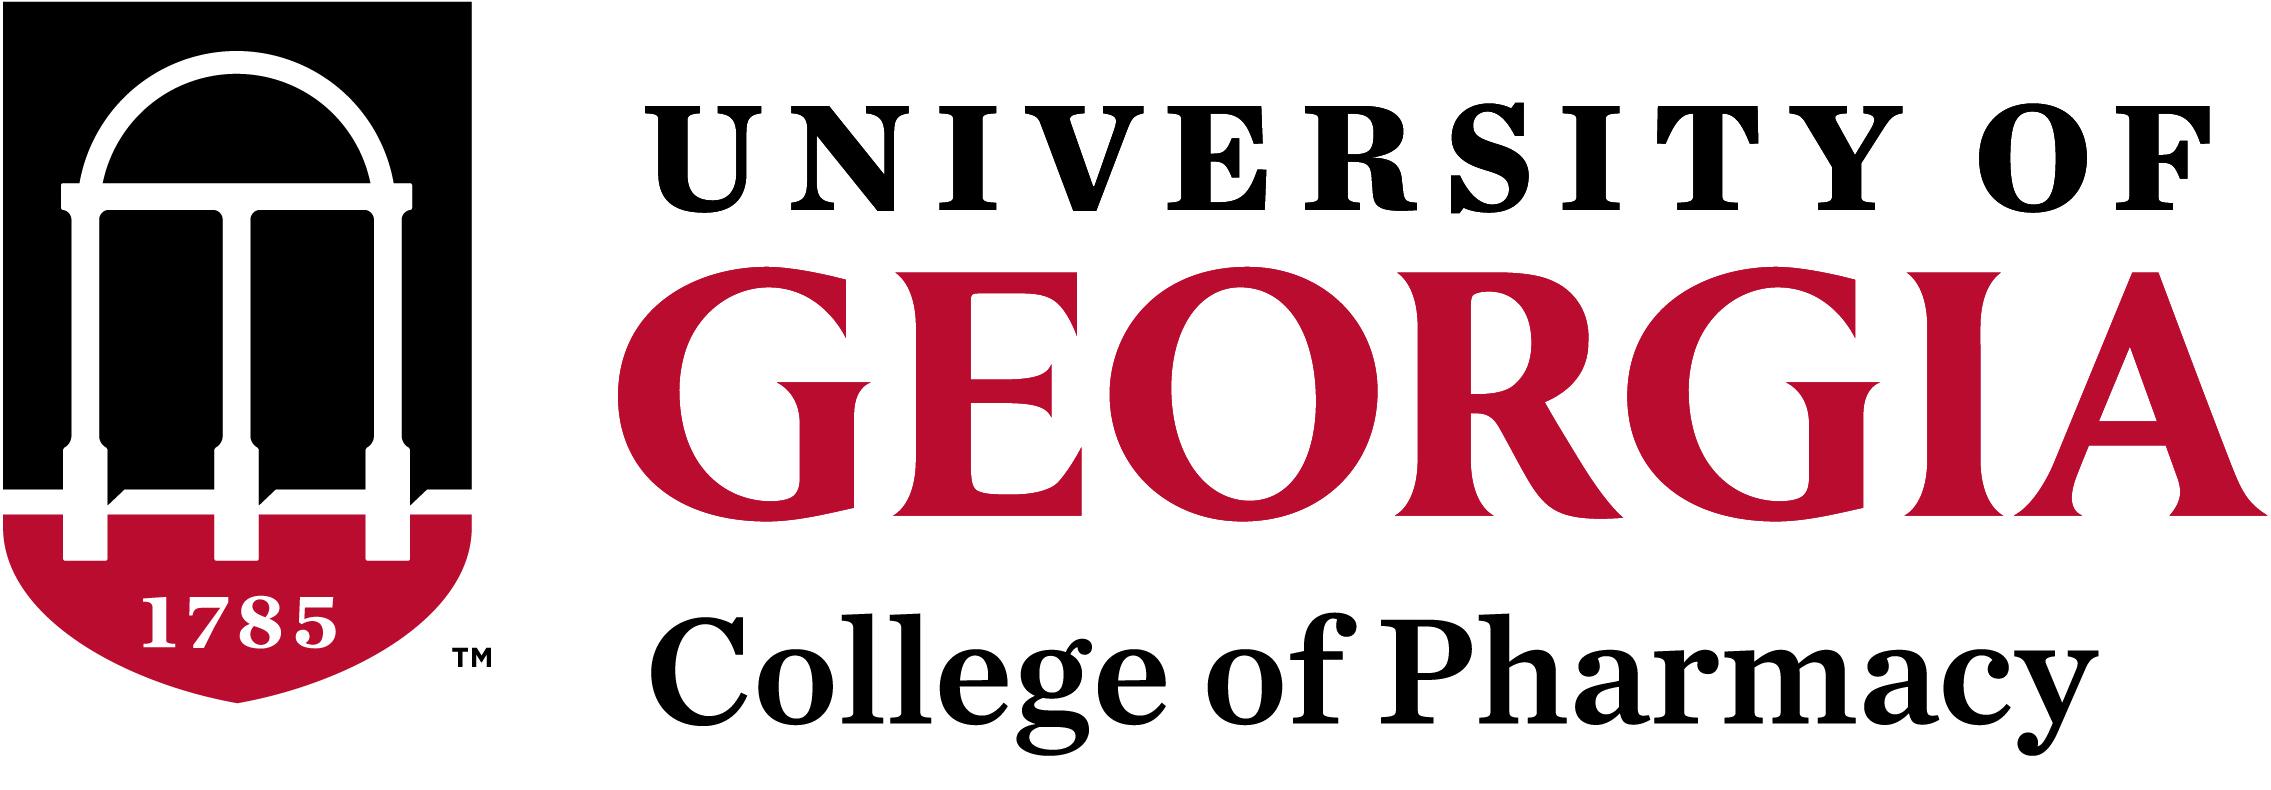 uga pharmacy school logo